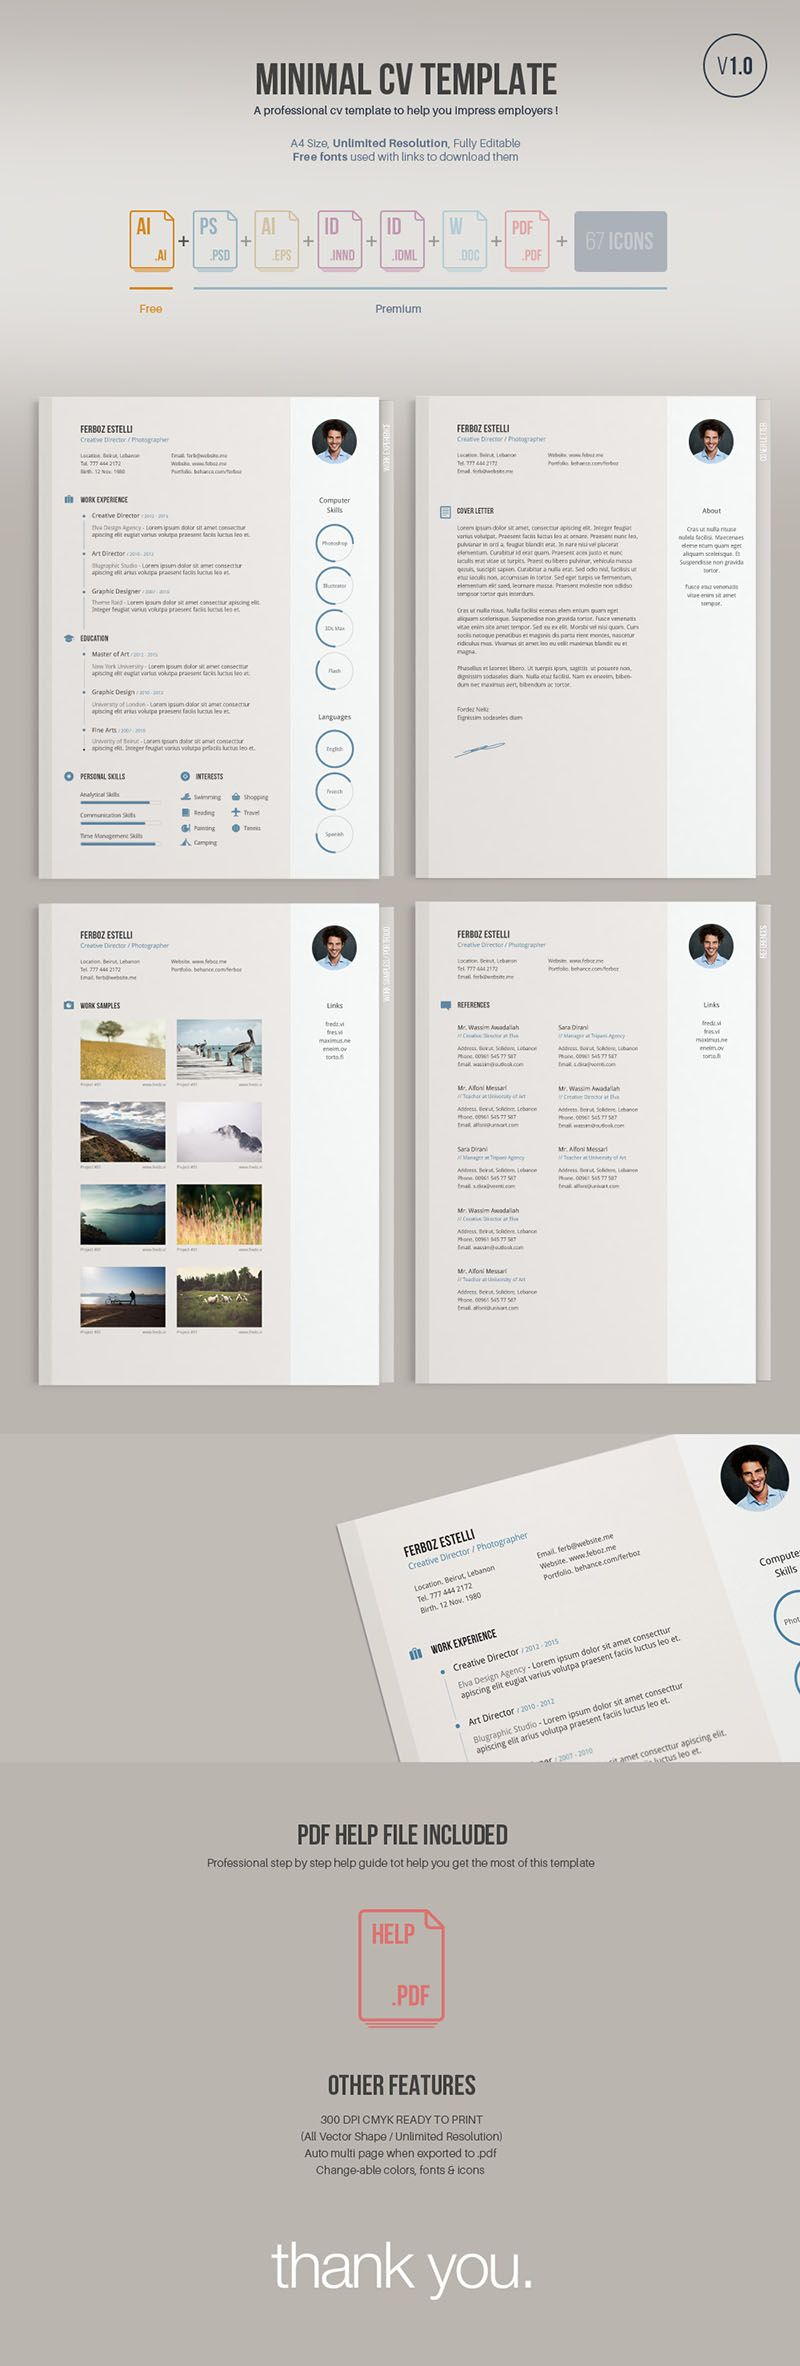 A minimal easy to edit free resume